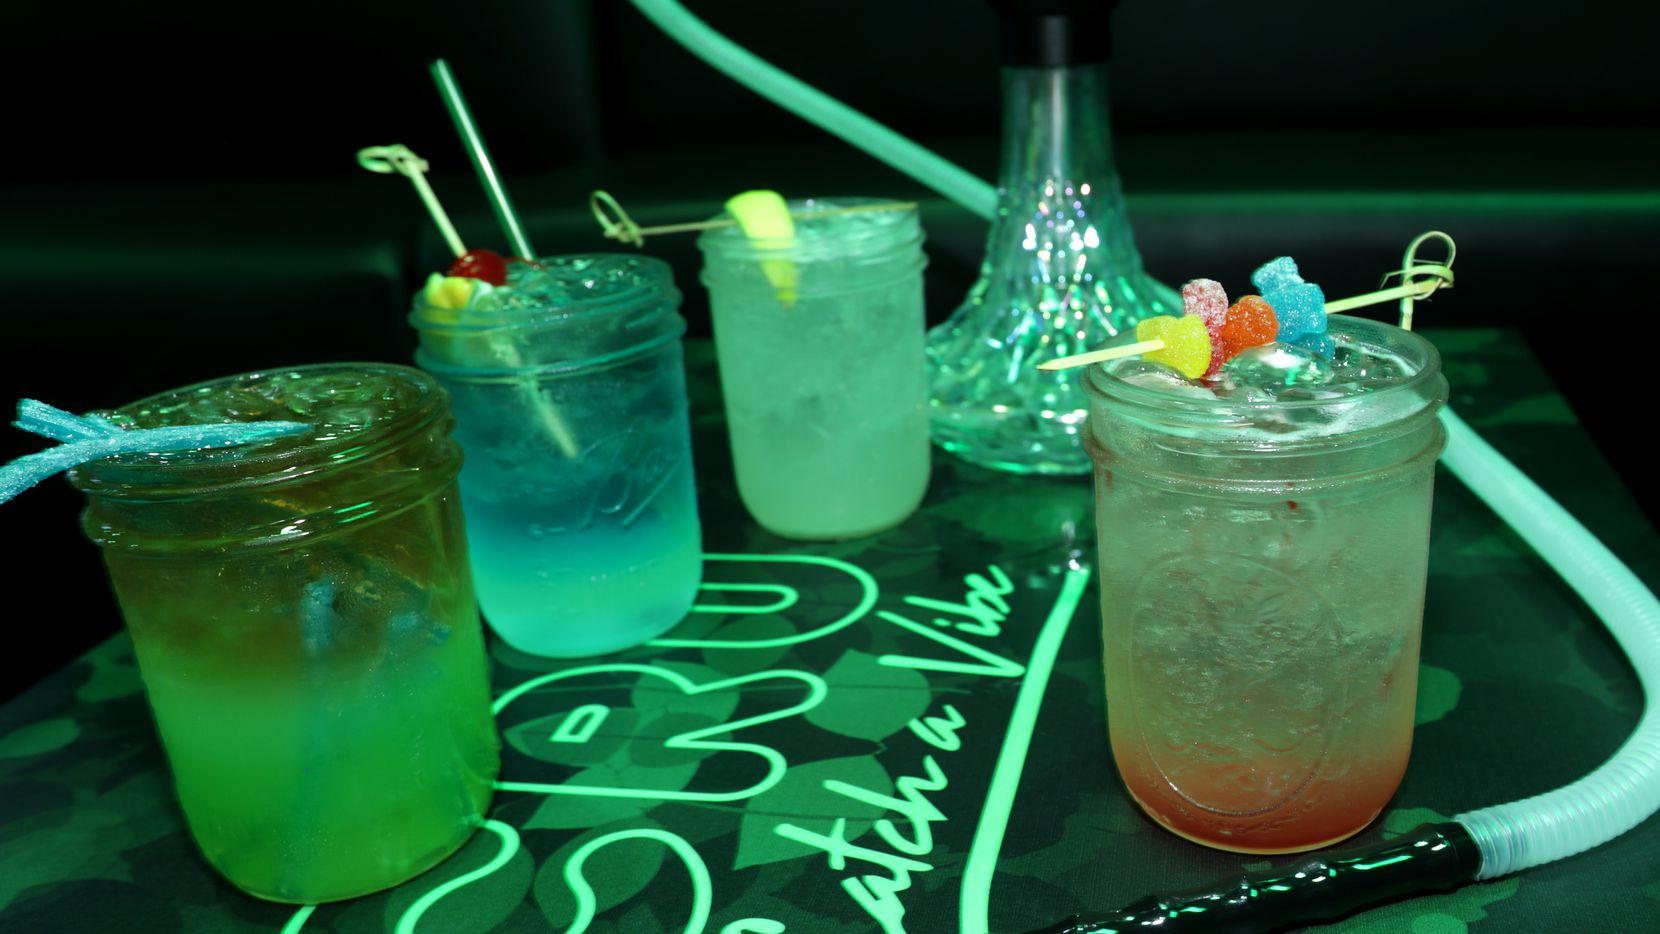 Cru Lounge is a restaurant and hookah bar now open on Belt Line Road in Carrollton.